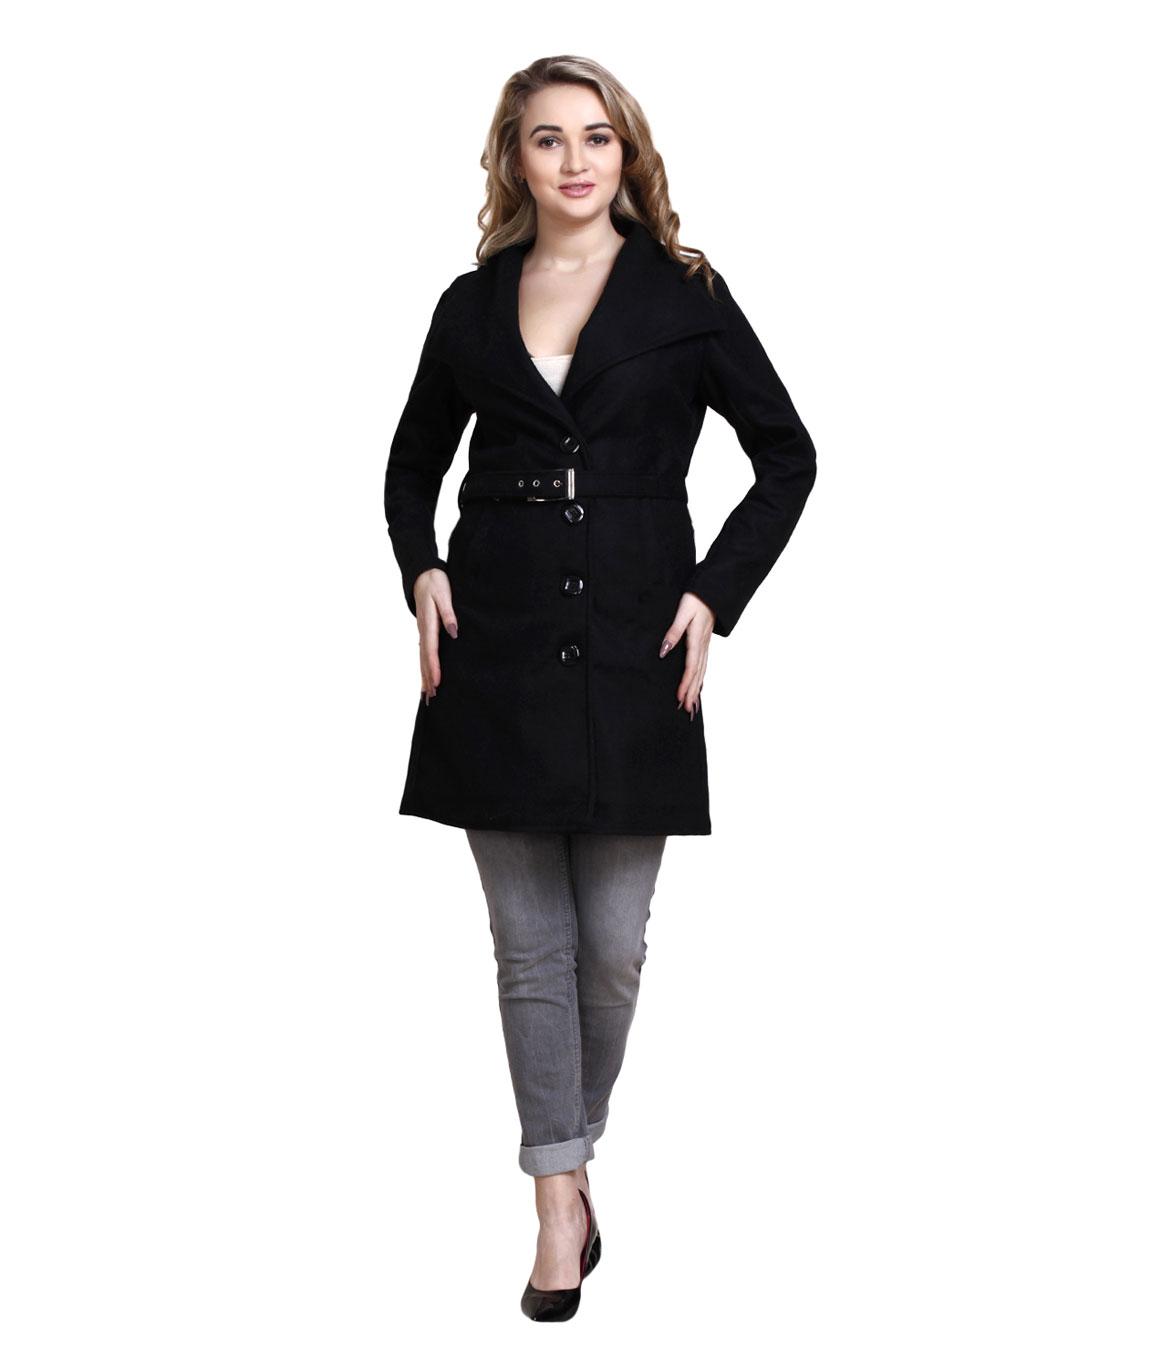 FAZZN Long Woolen Coats(Black)